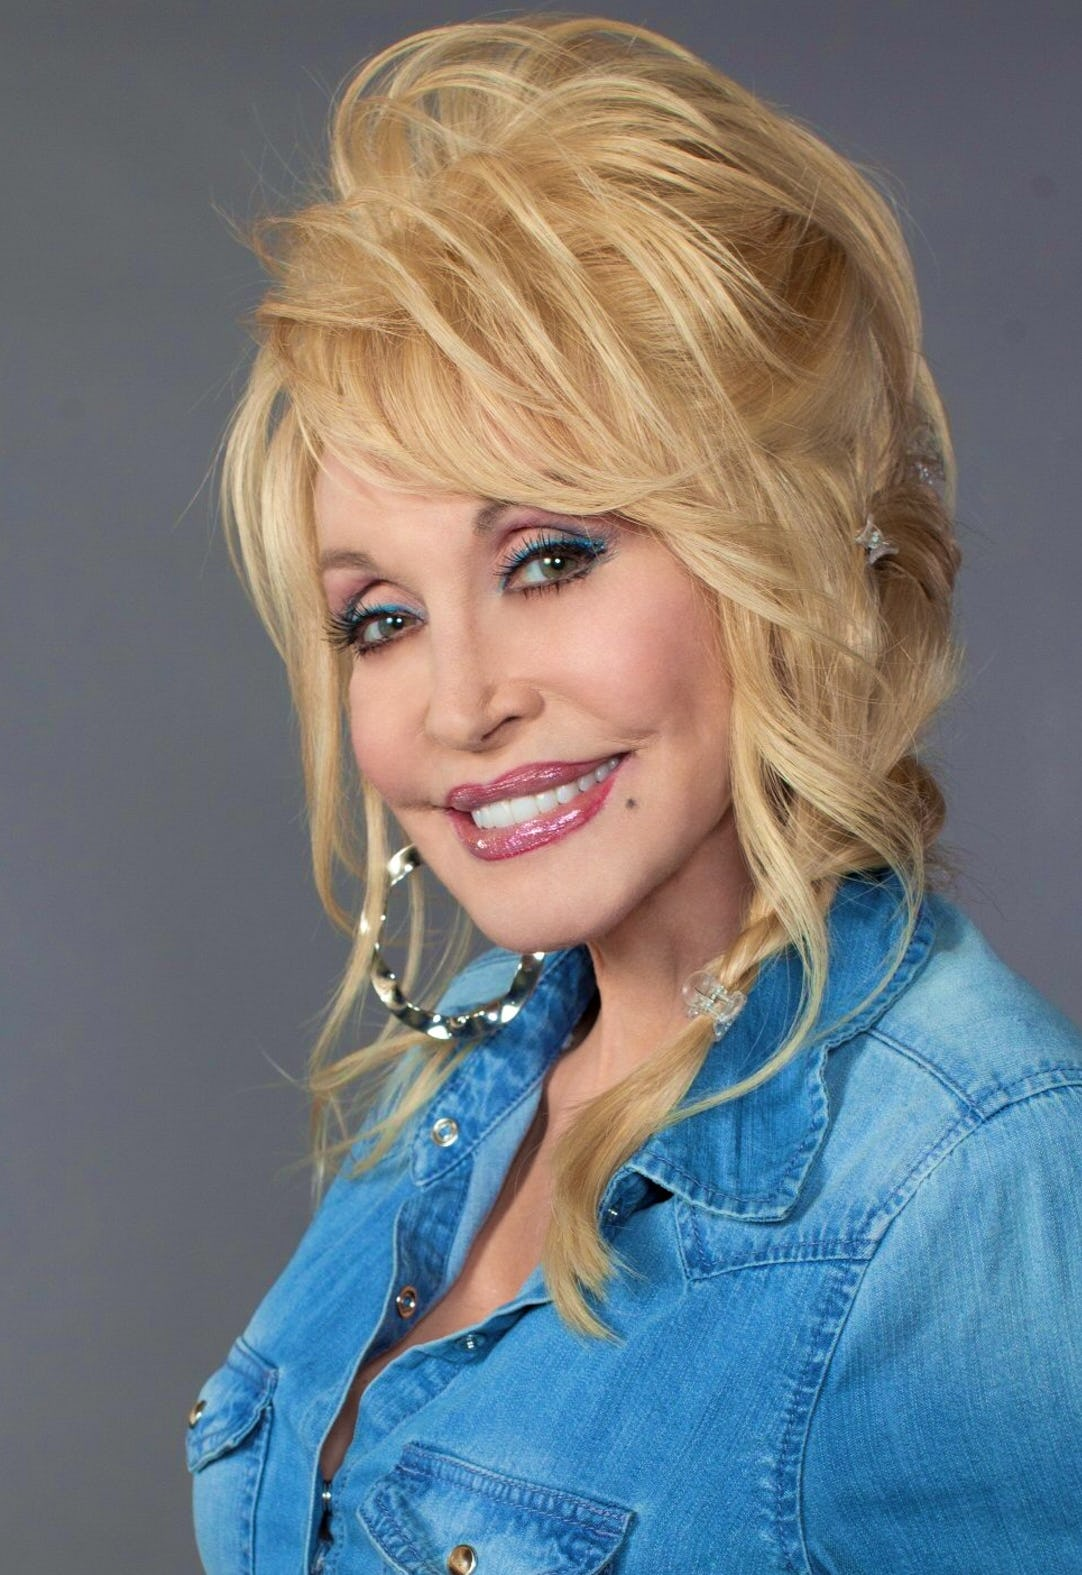 Dolly Parton Tour Dates & Tickets 2021 | Ents24